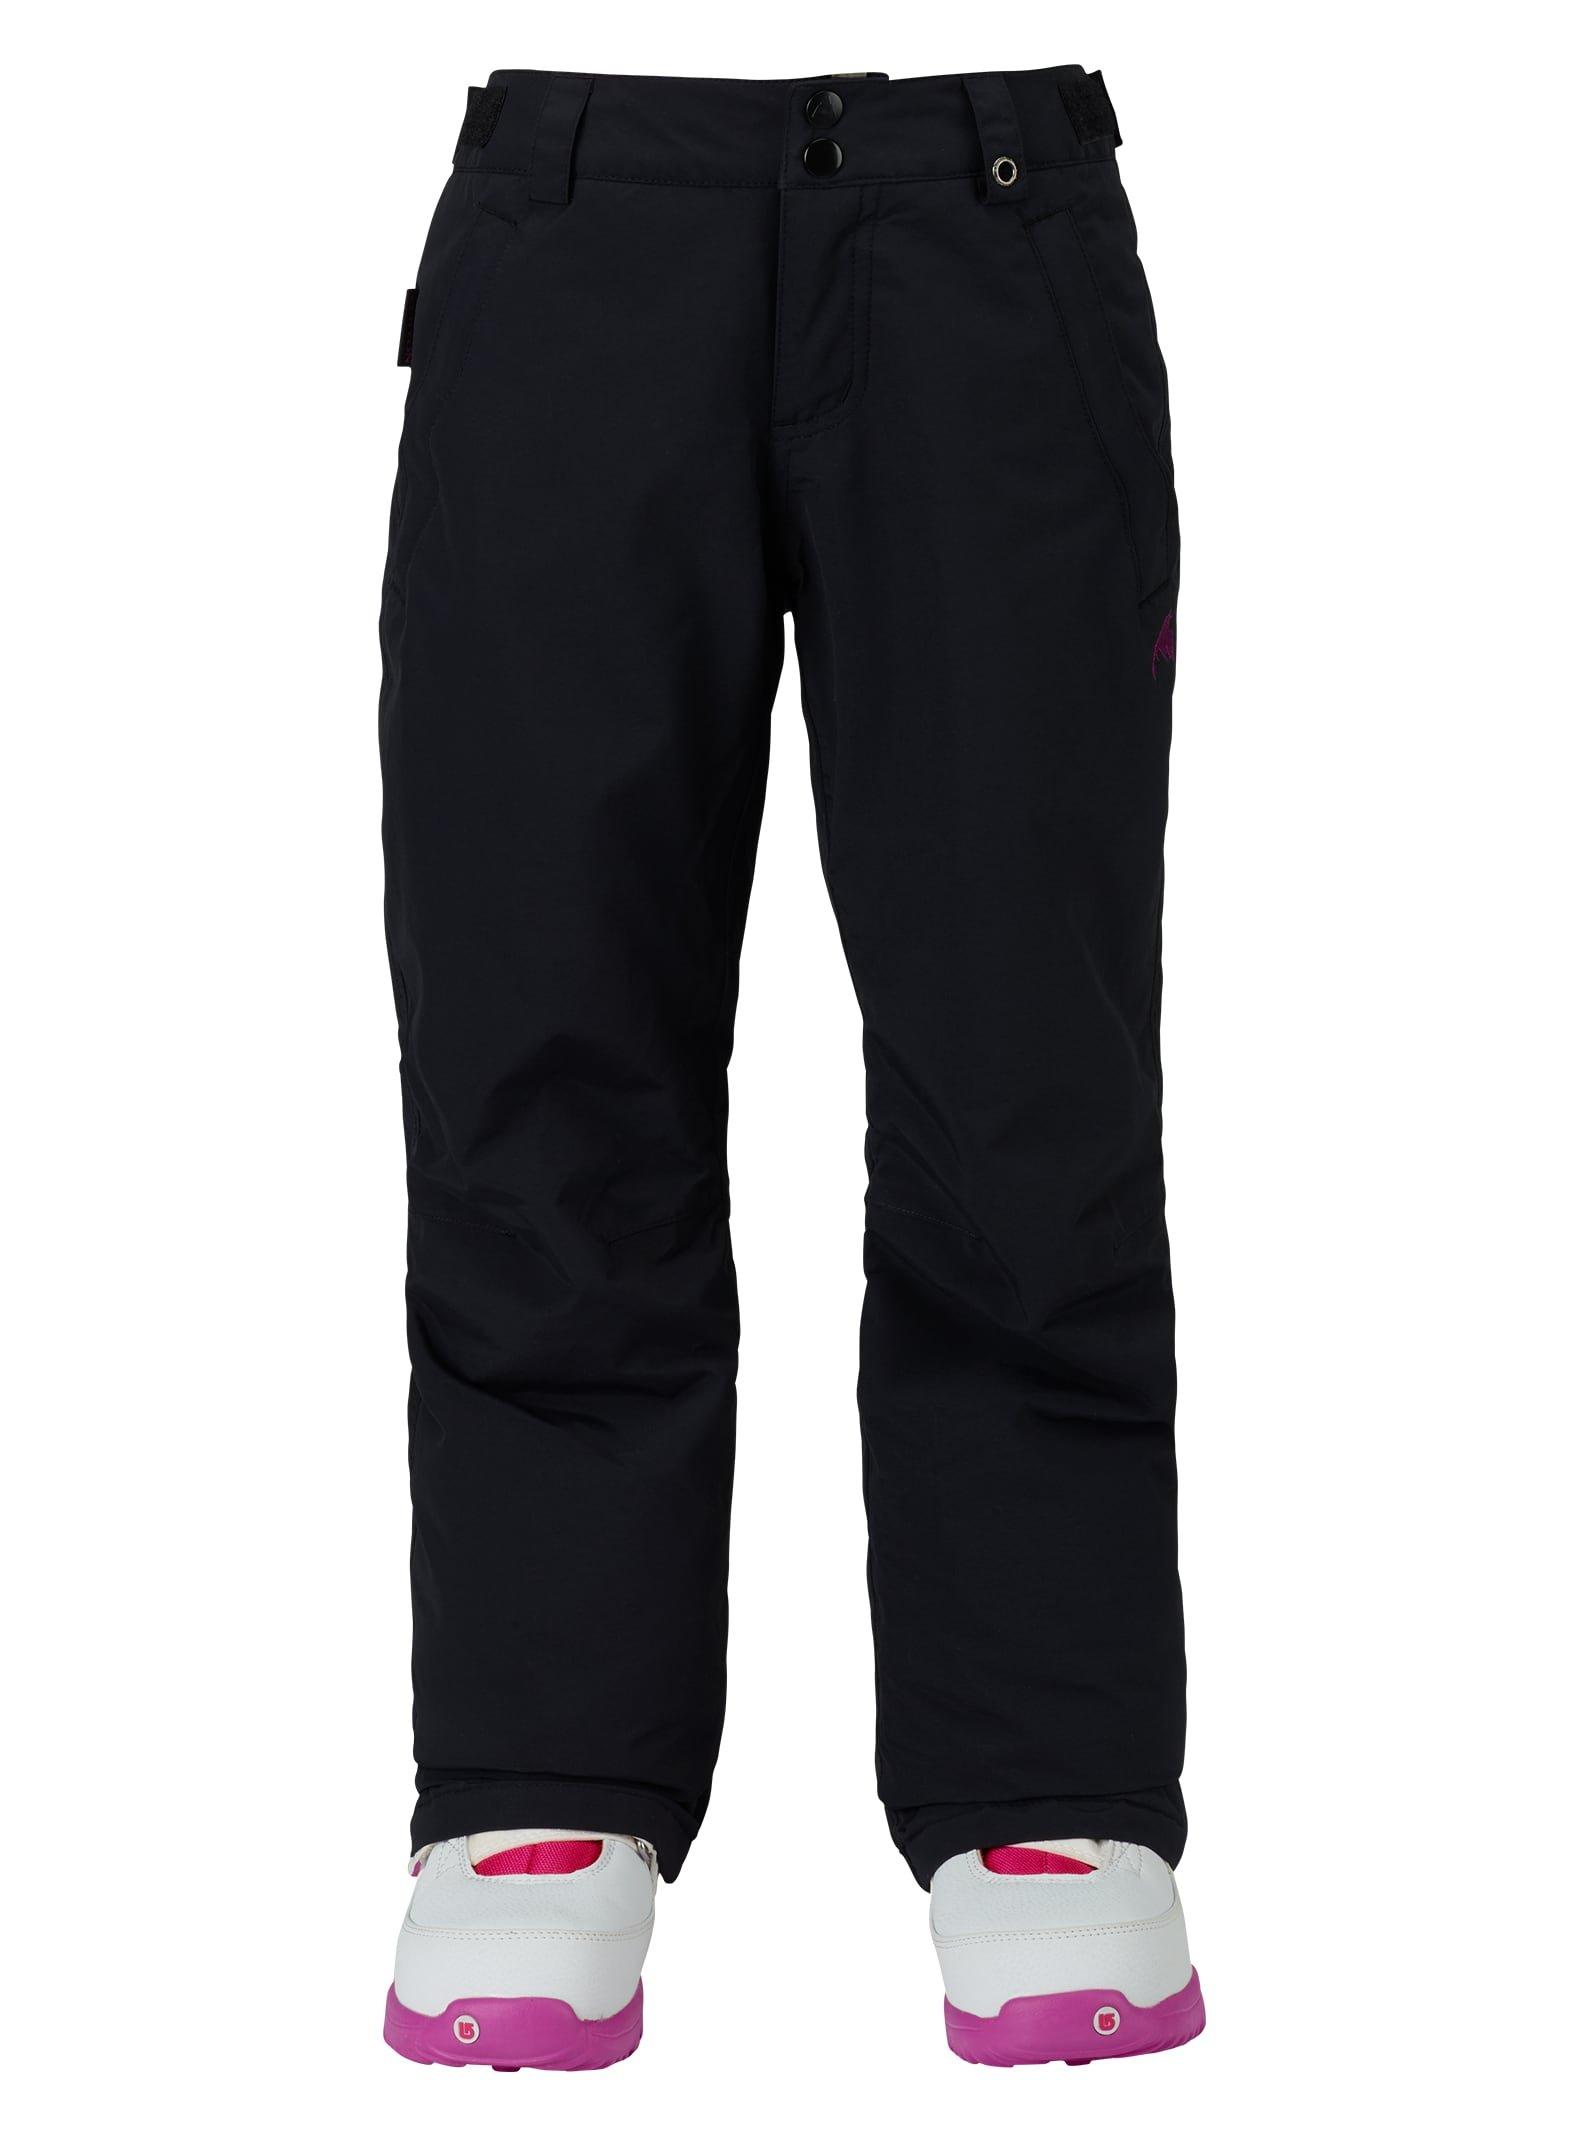 Burton Girl's Sweetart Pant, True Black 1, Medium